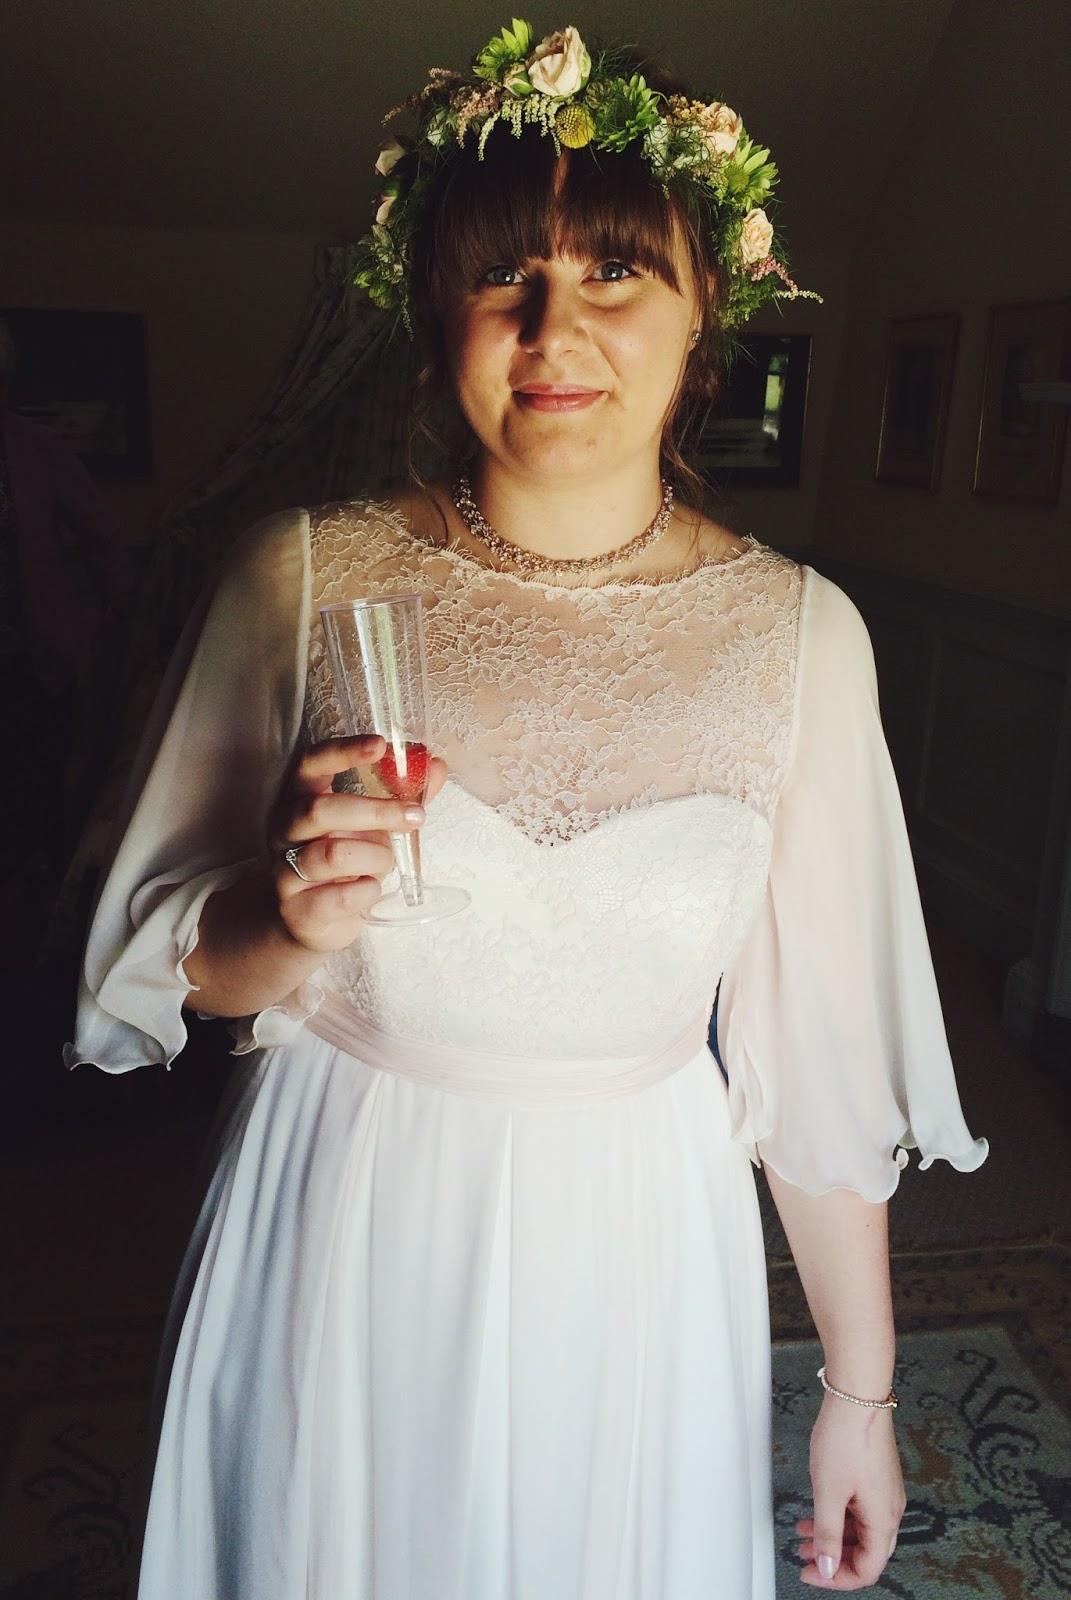 Wedding dress - Combe Manor wedding